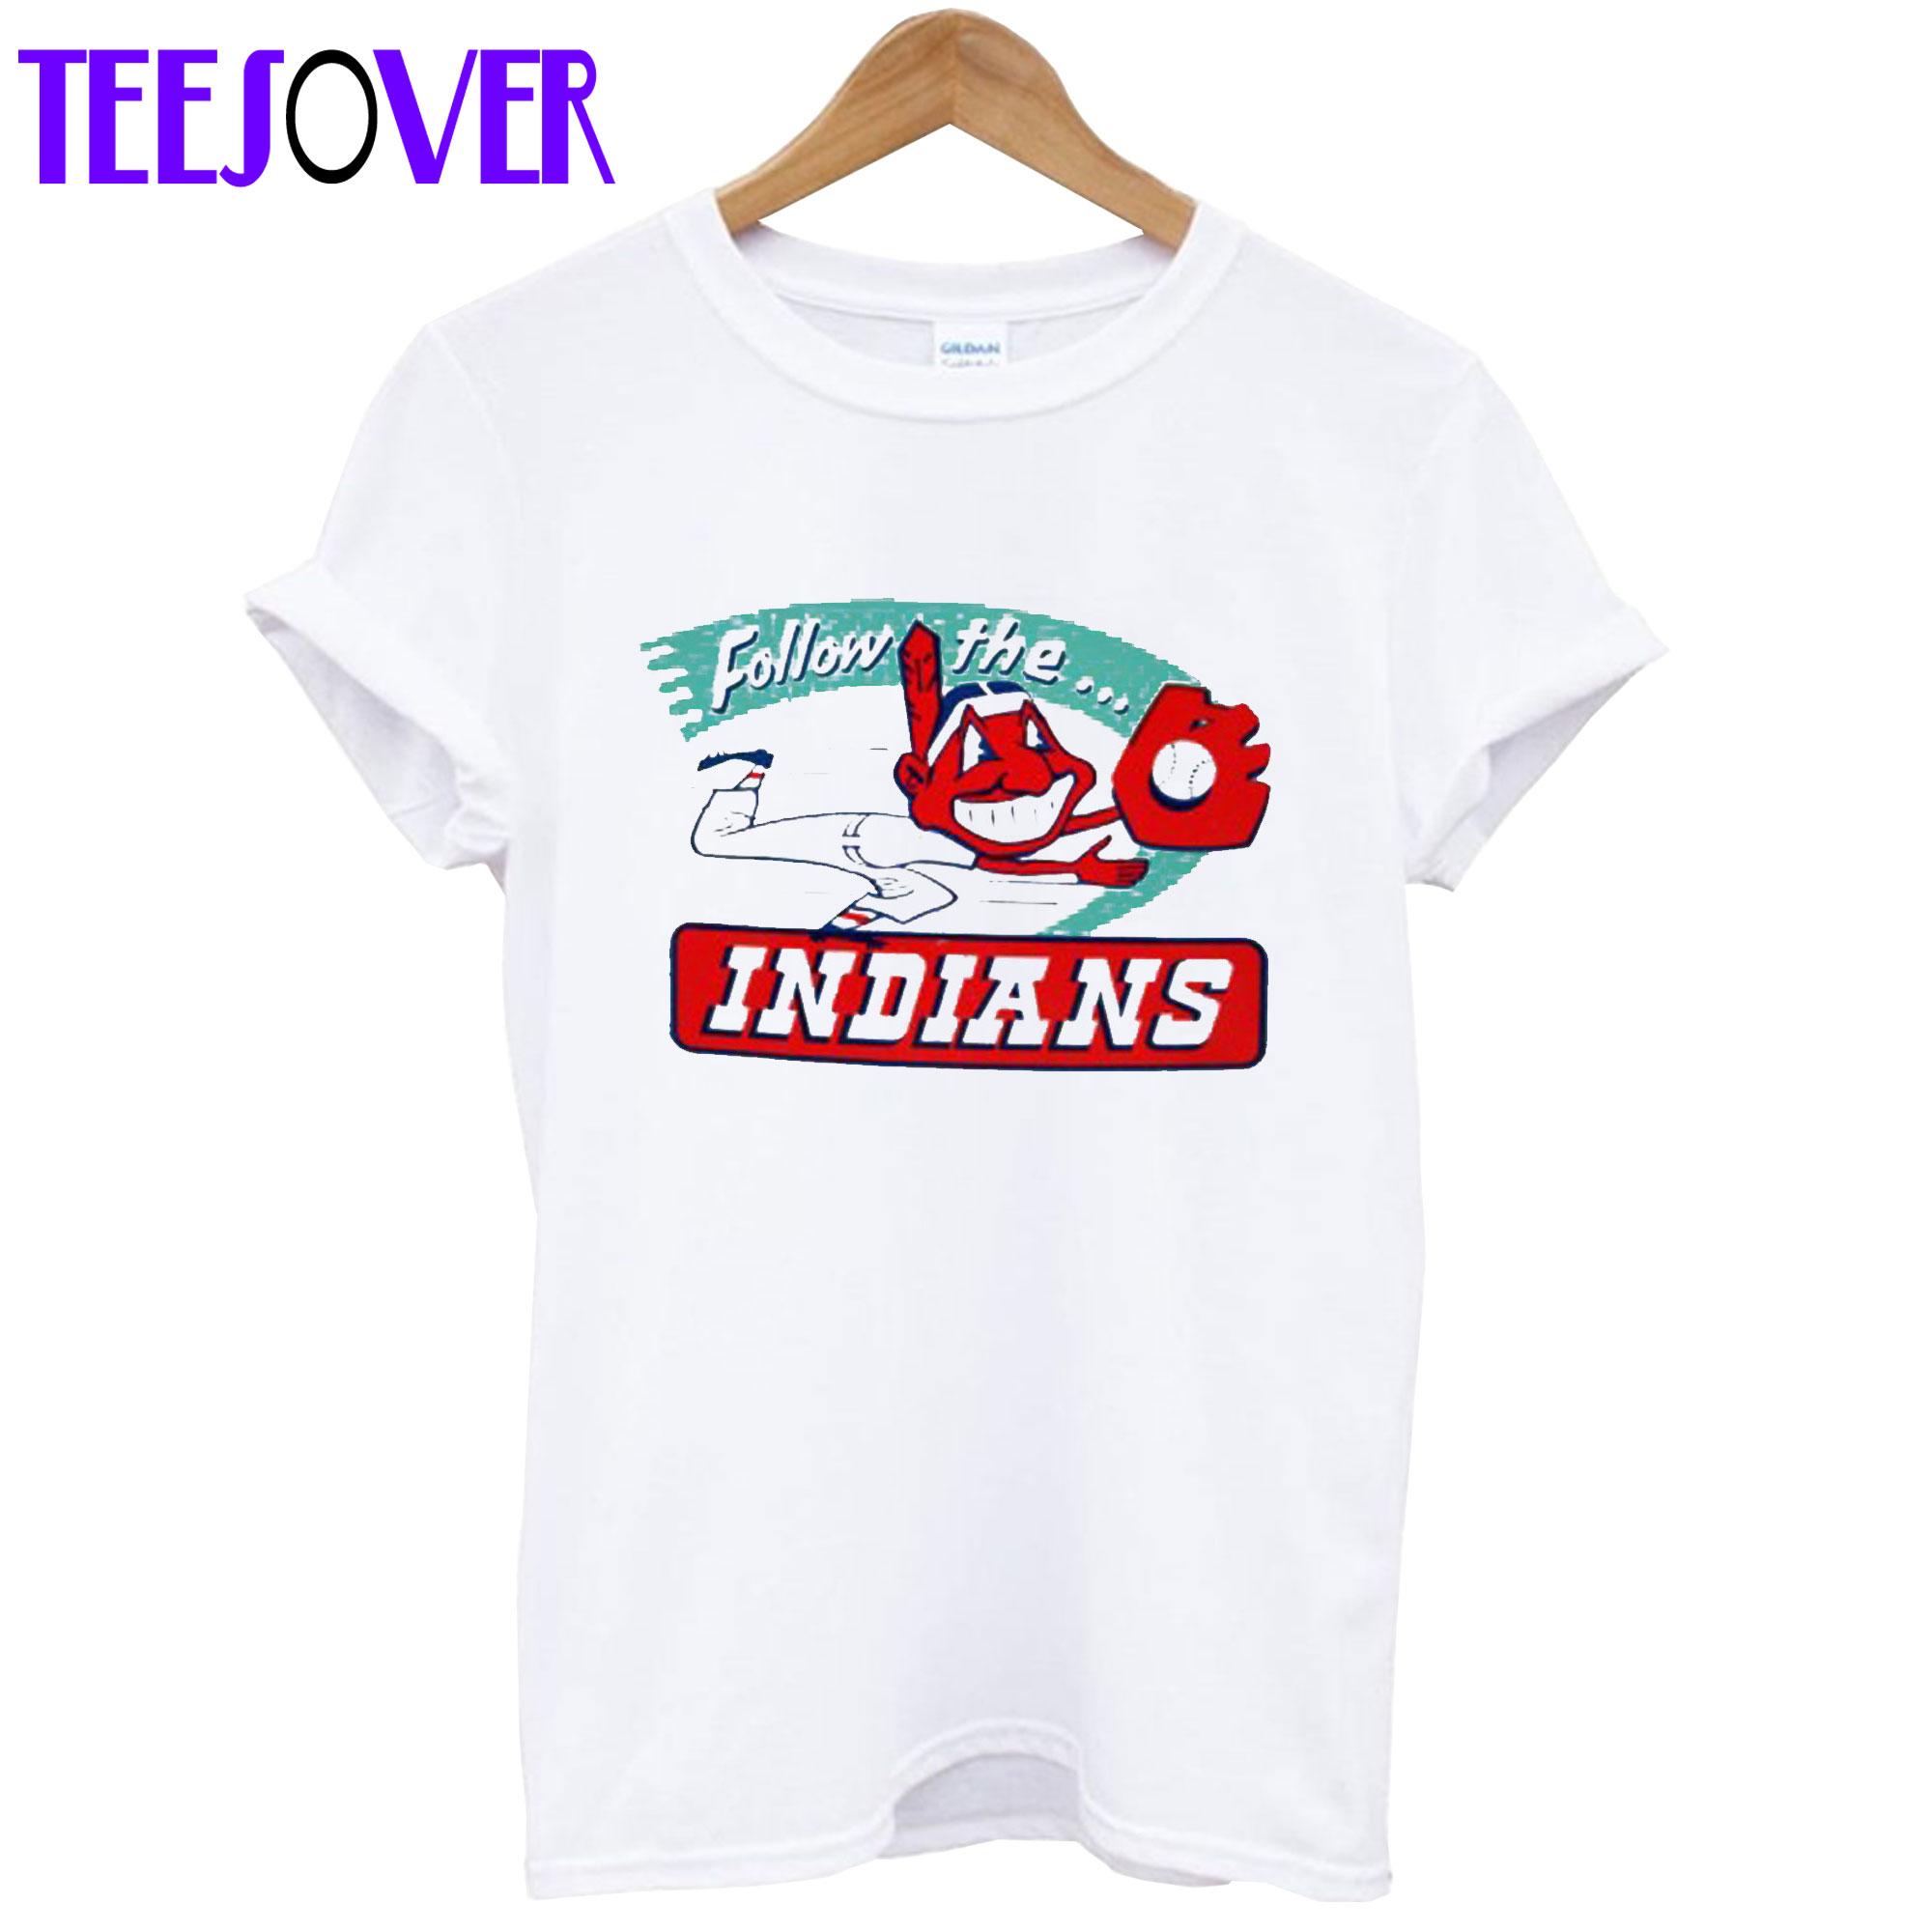 1954 Cleveland Indians T-Shirt